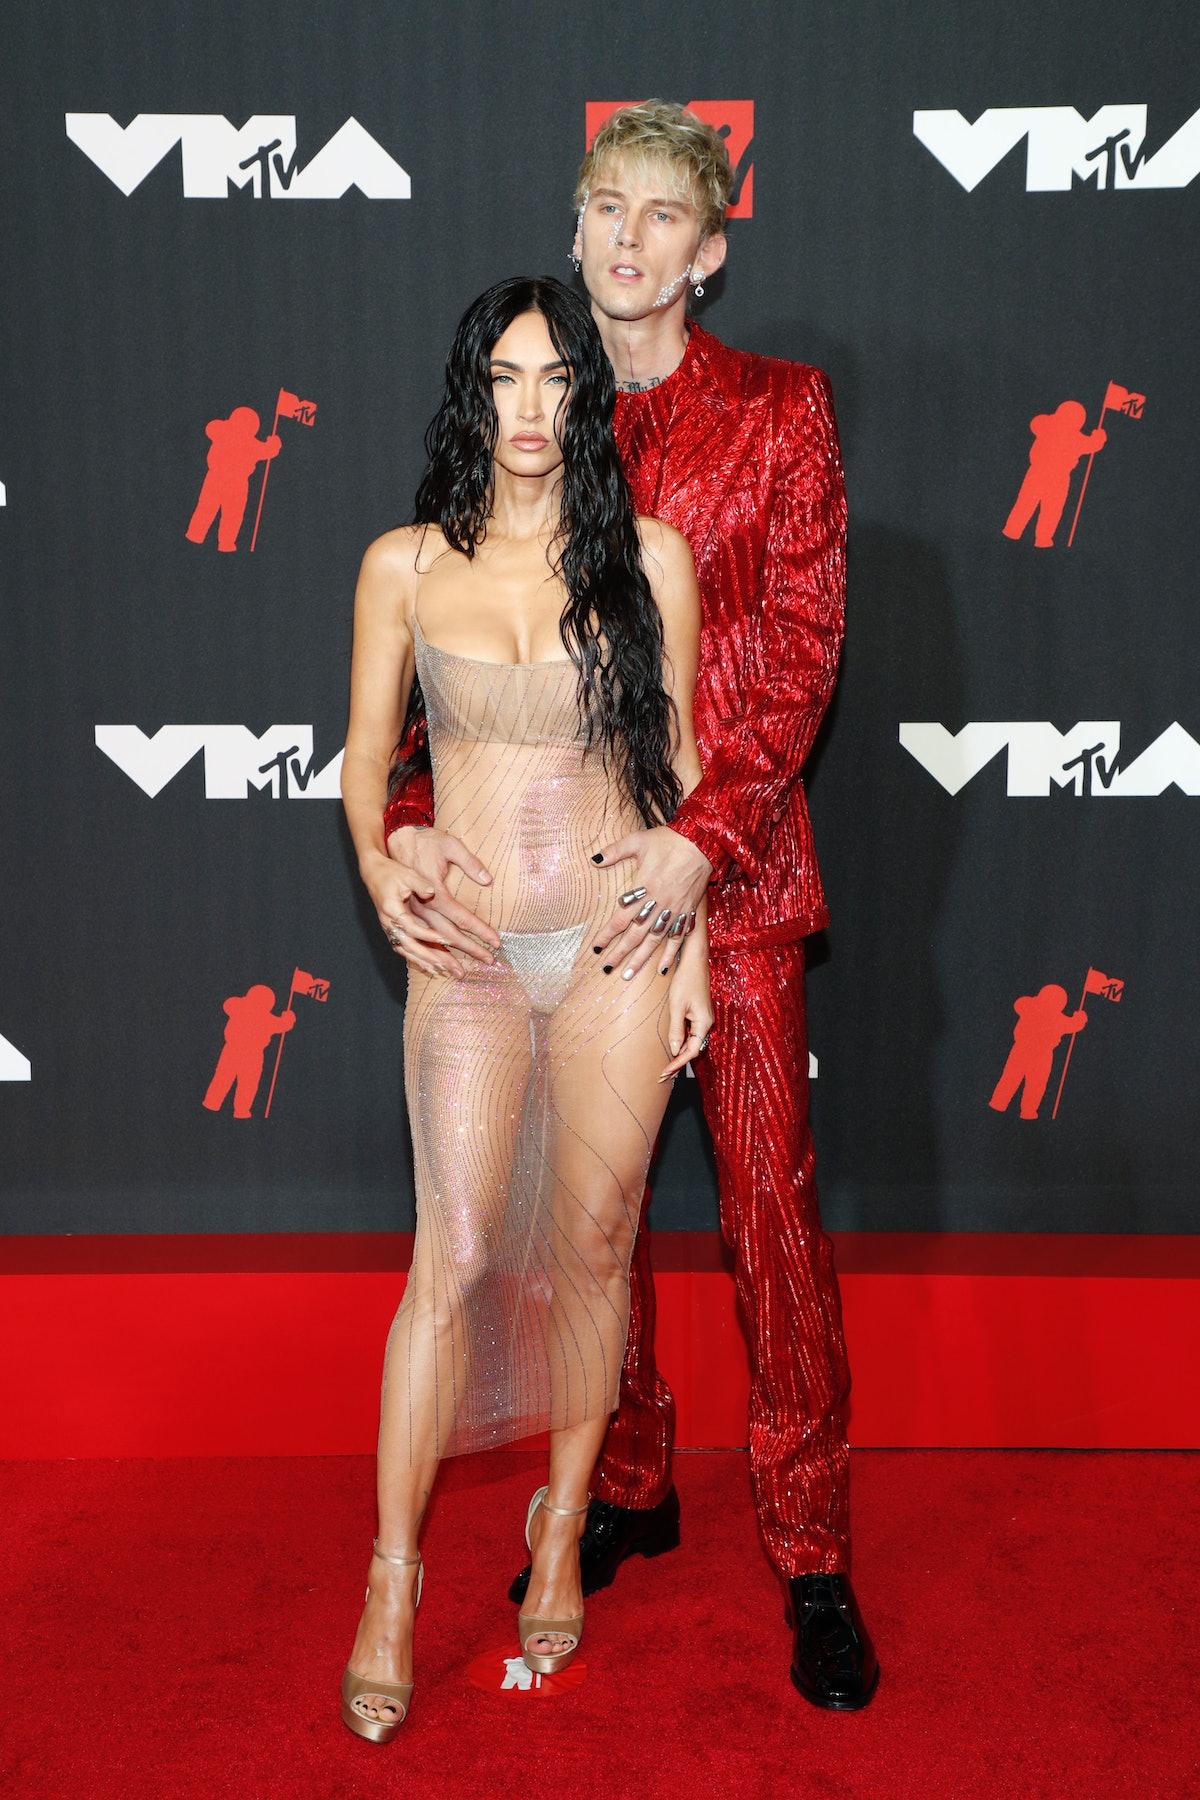 Megan Fox and Machine Gun Kelly's VMAs body language was intense.